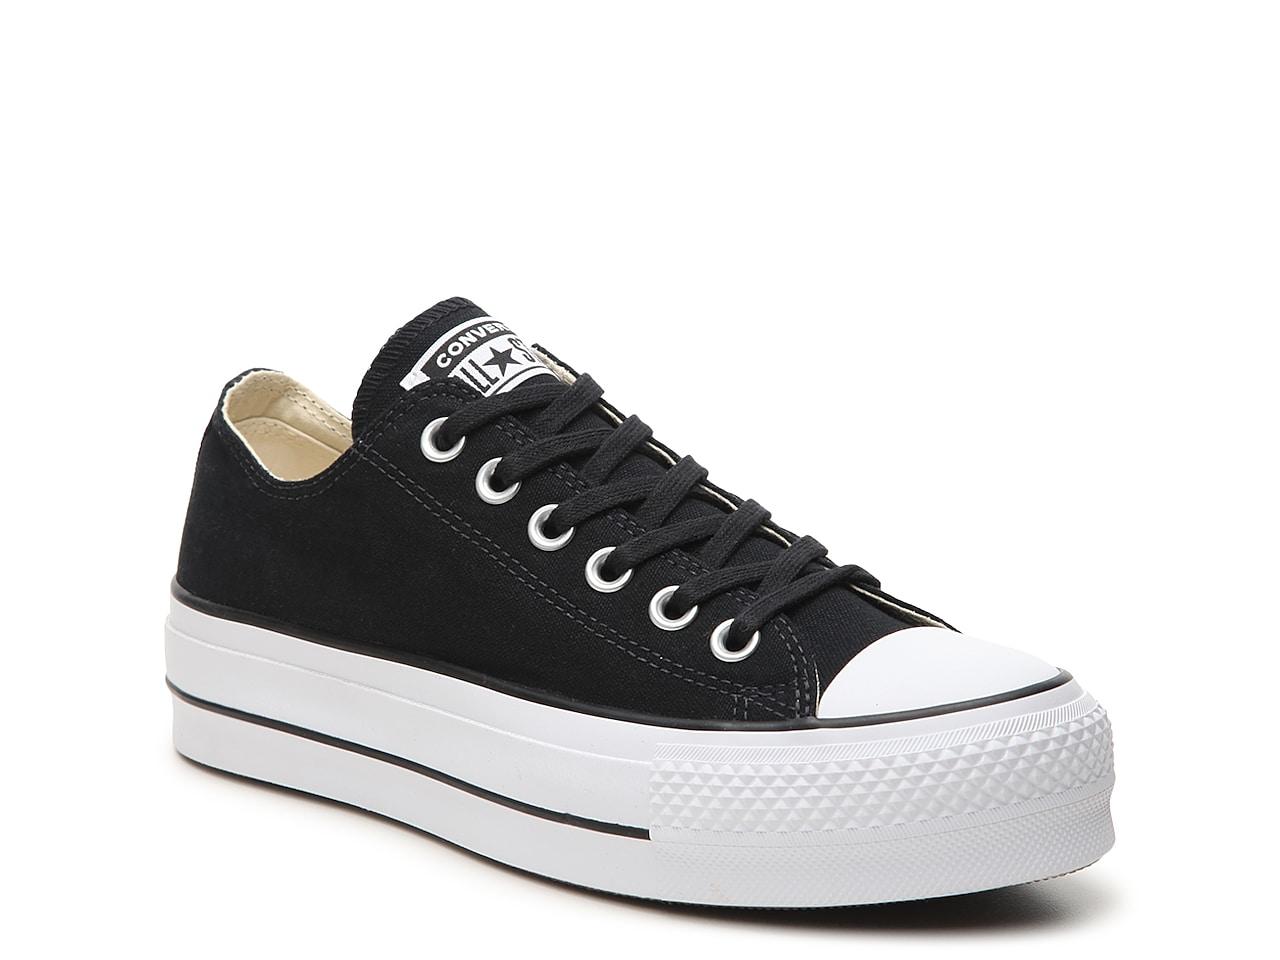 Sposarsi capo Sì  Converse Chuck Taylor All Star Lift Platform Sneaker - Women's Women's Shoes  | DSW